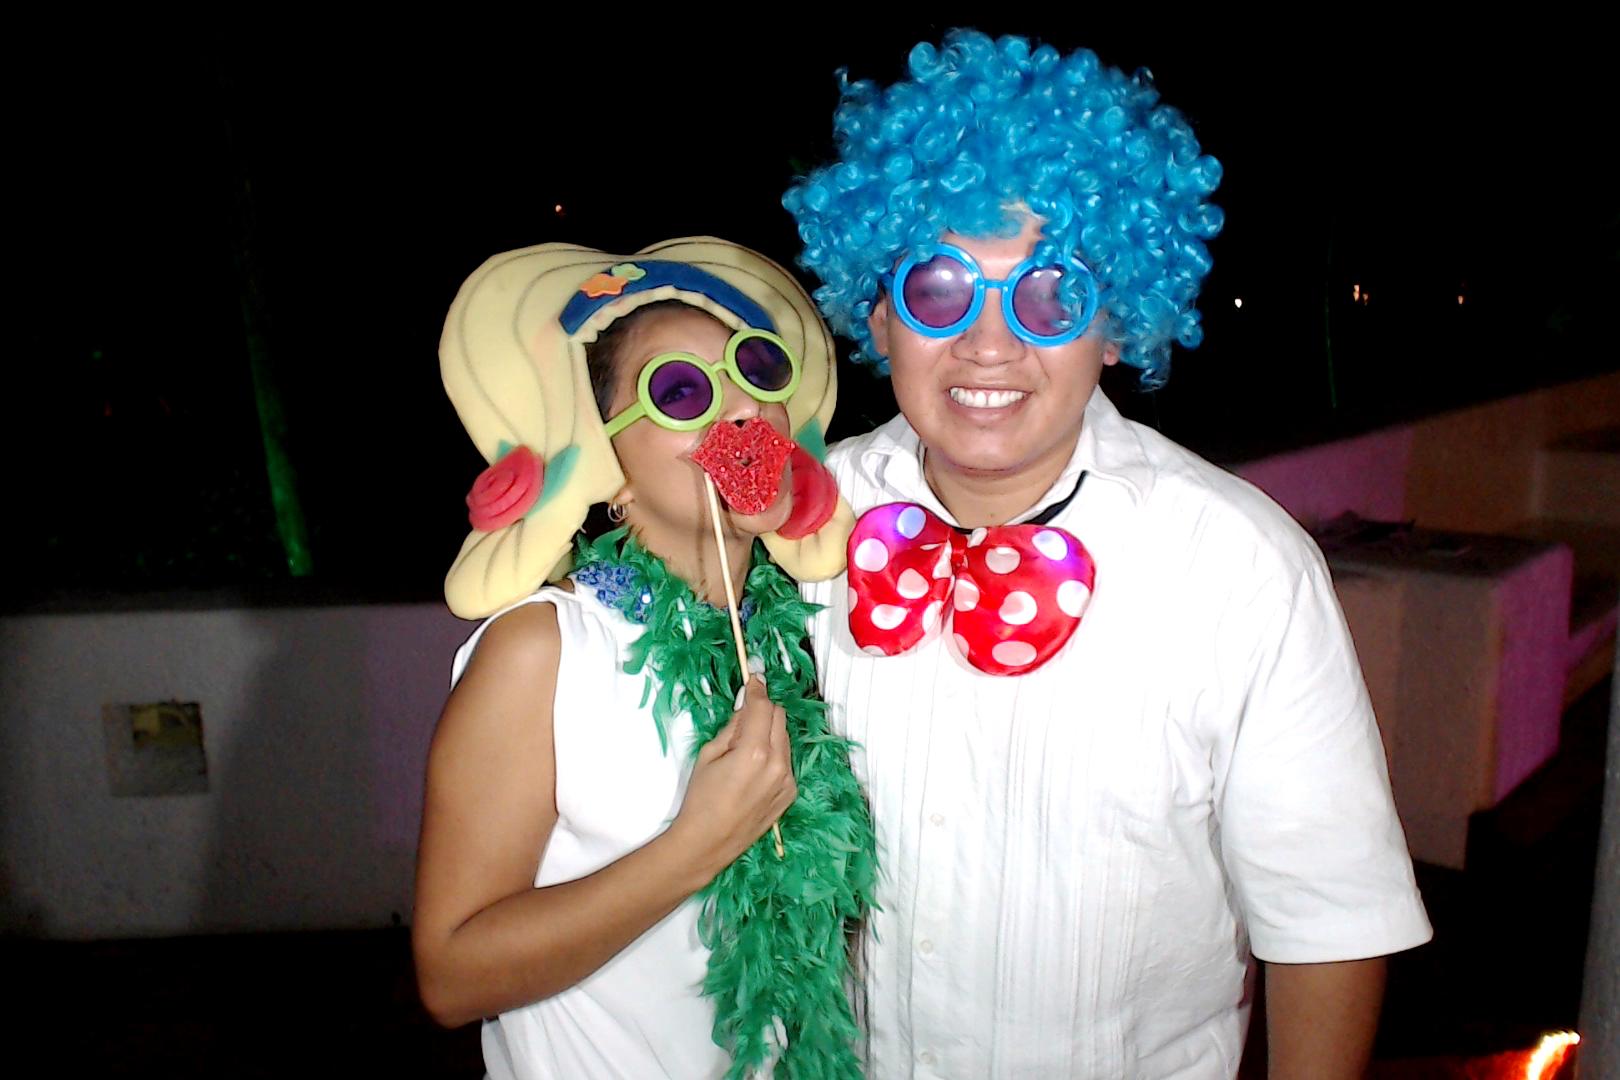 PlayadelCarmenPhotoBoothMexico0033.JPG